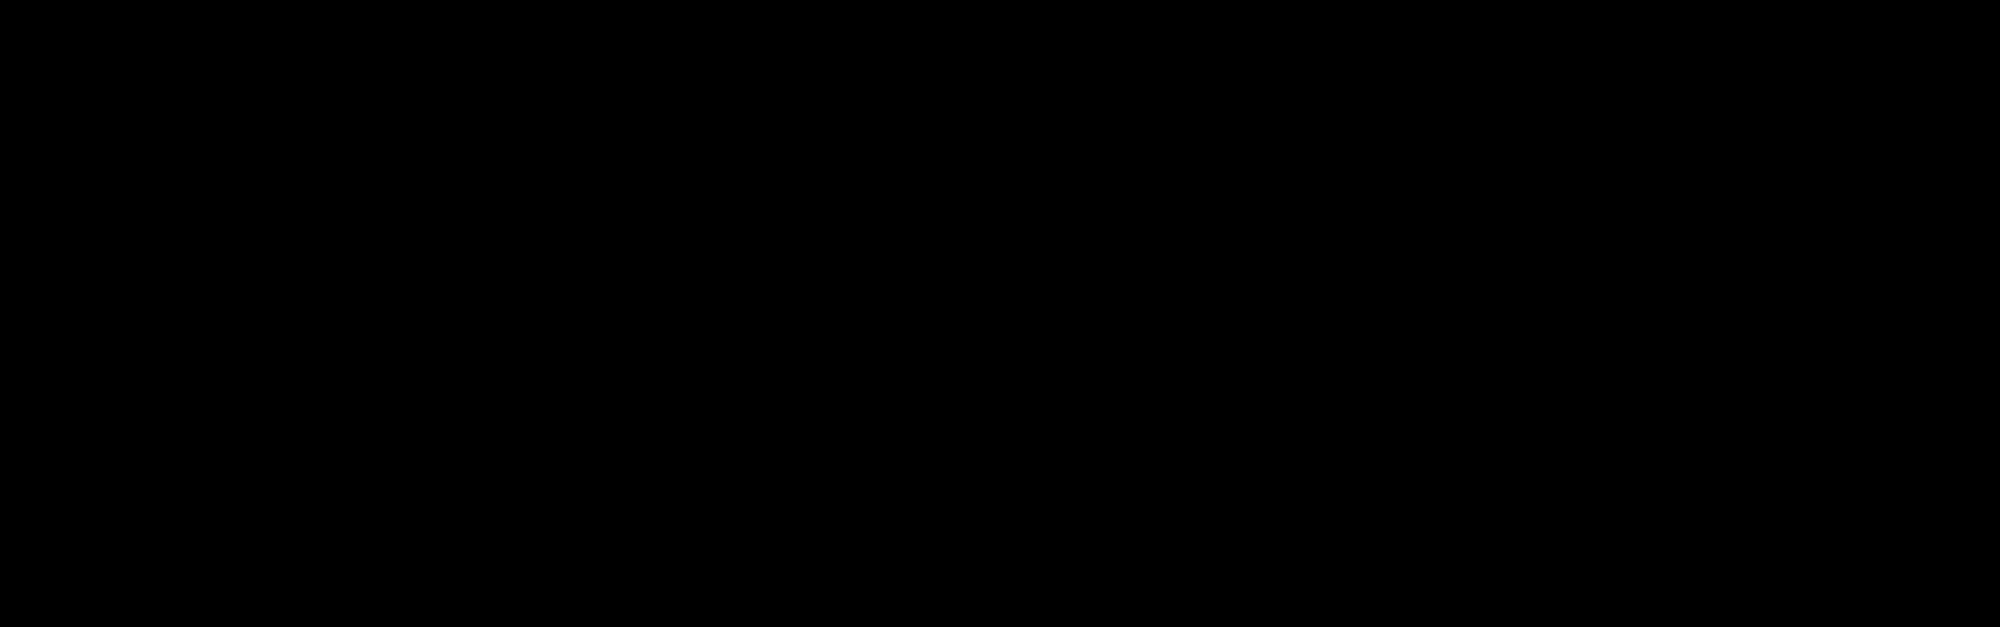 Bedding & Feeding-logo-black.png